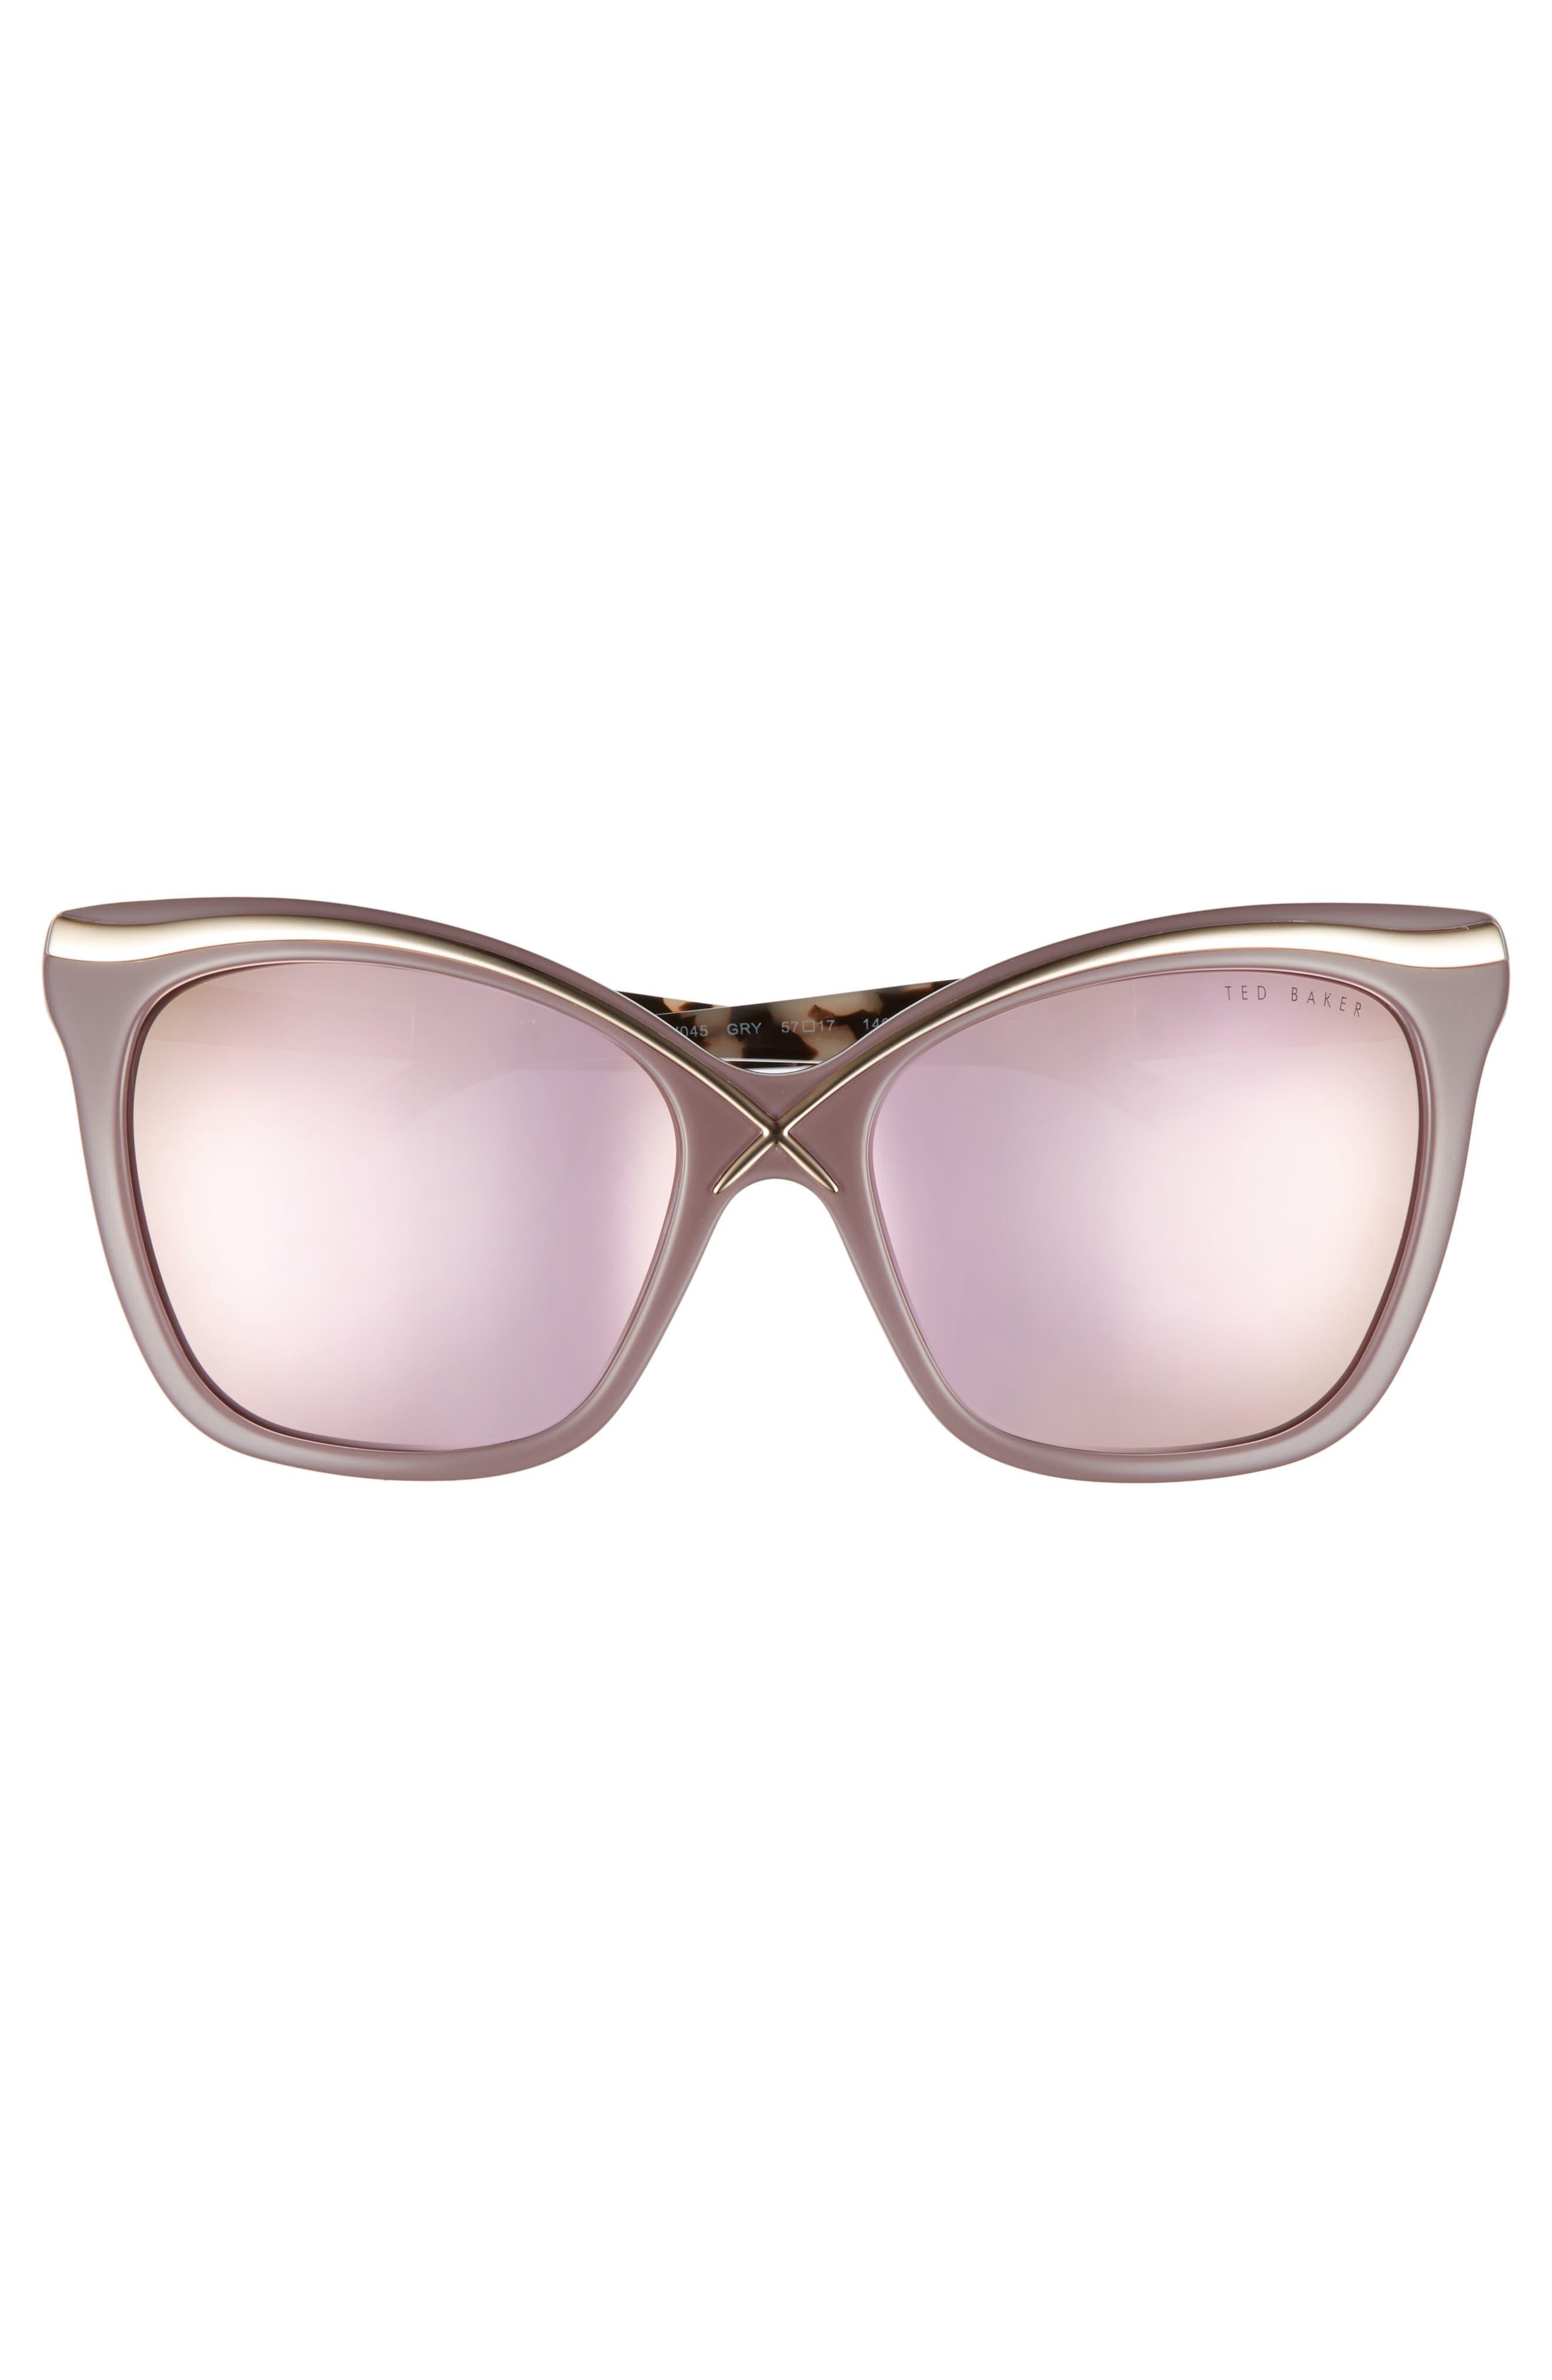 57mm Square Cat Eye Sunglasses,                             Alternate thumbnail 3, color,                             Grey